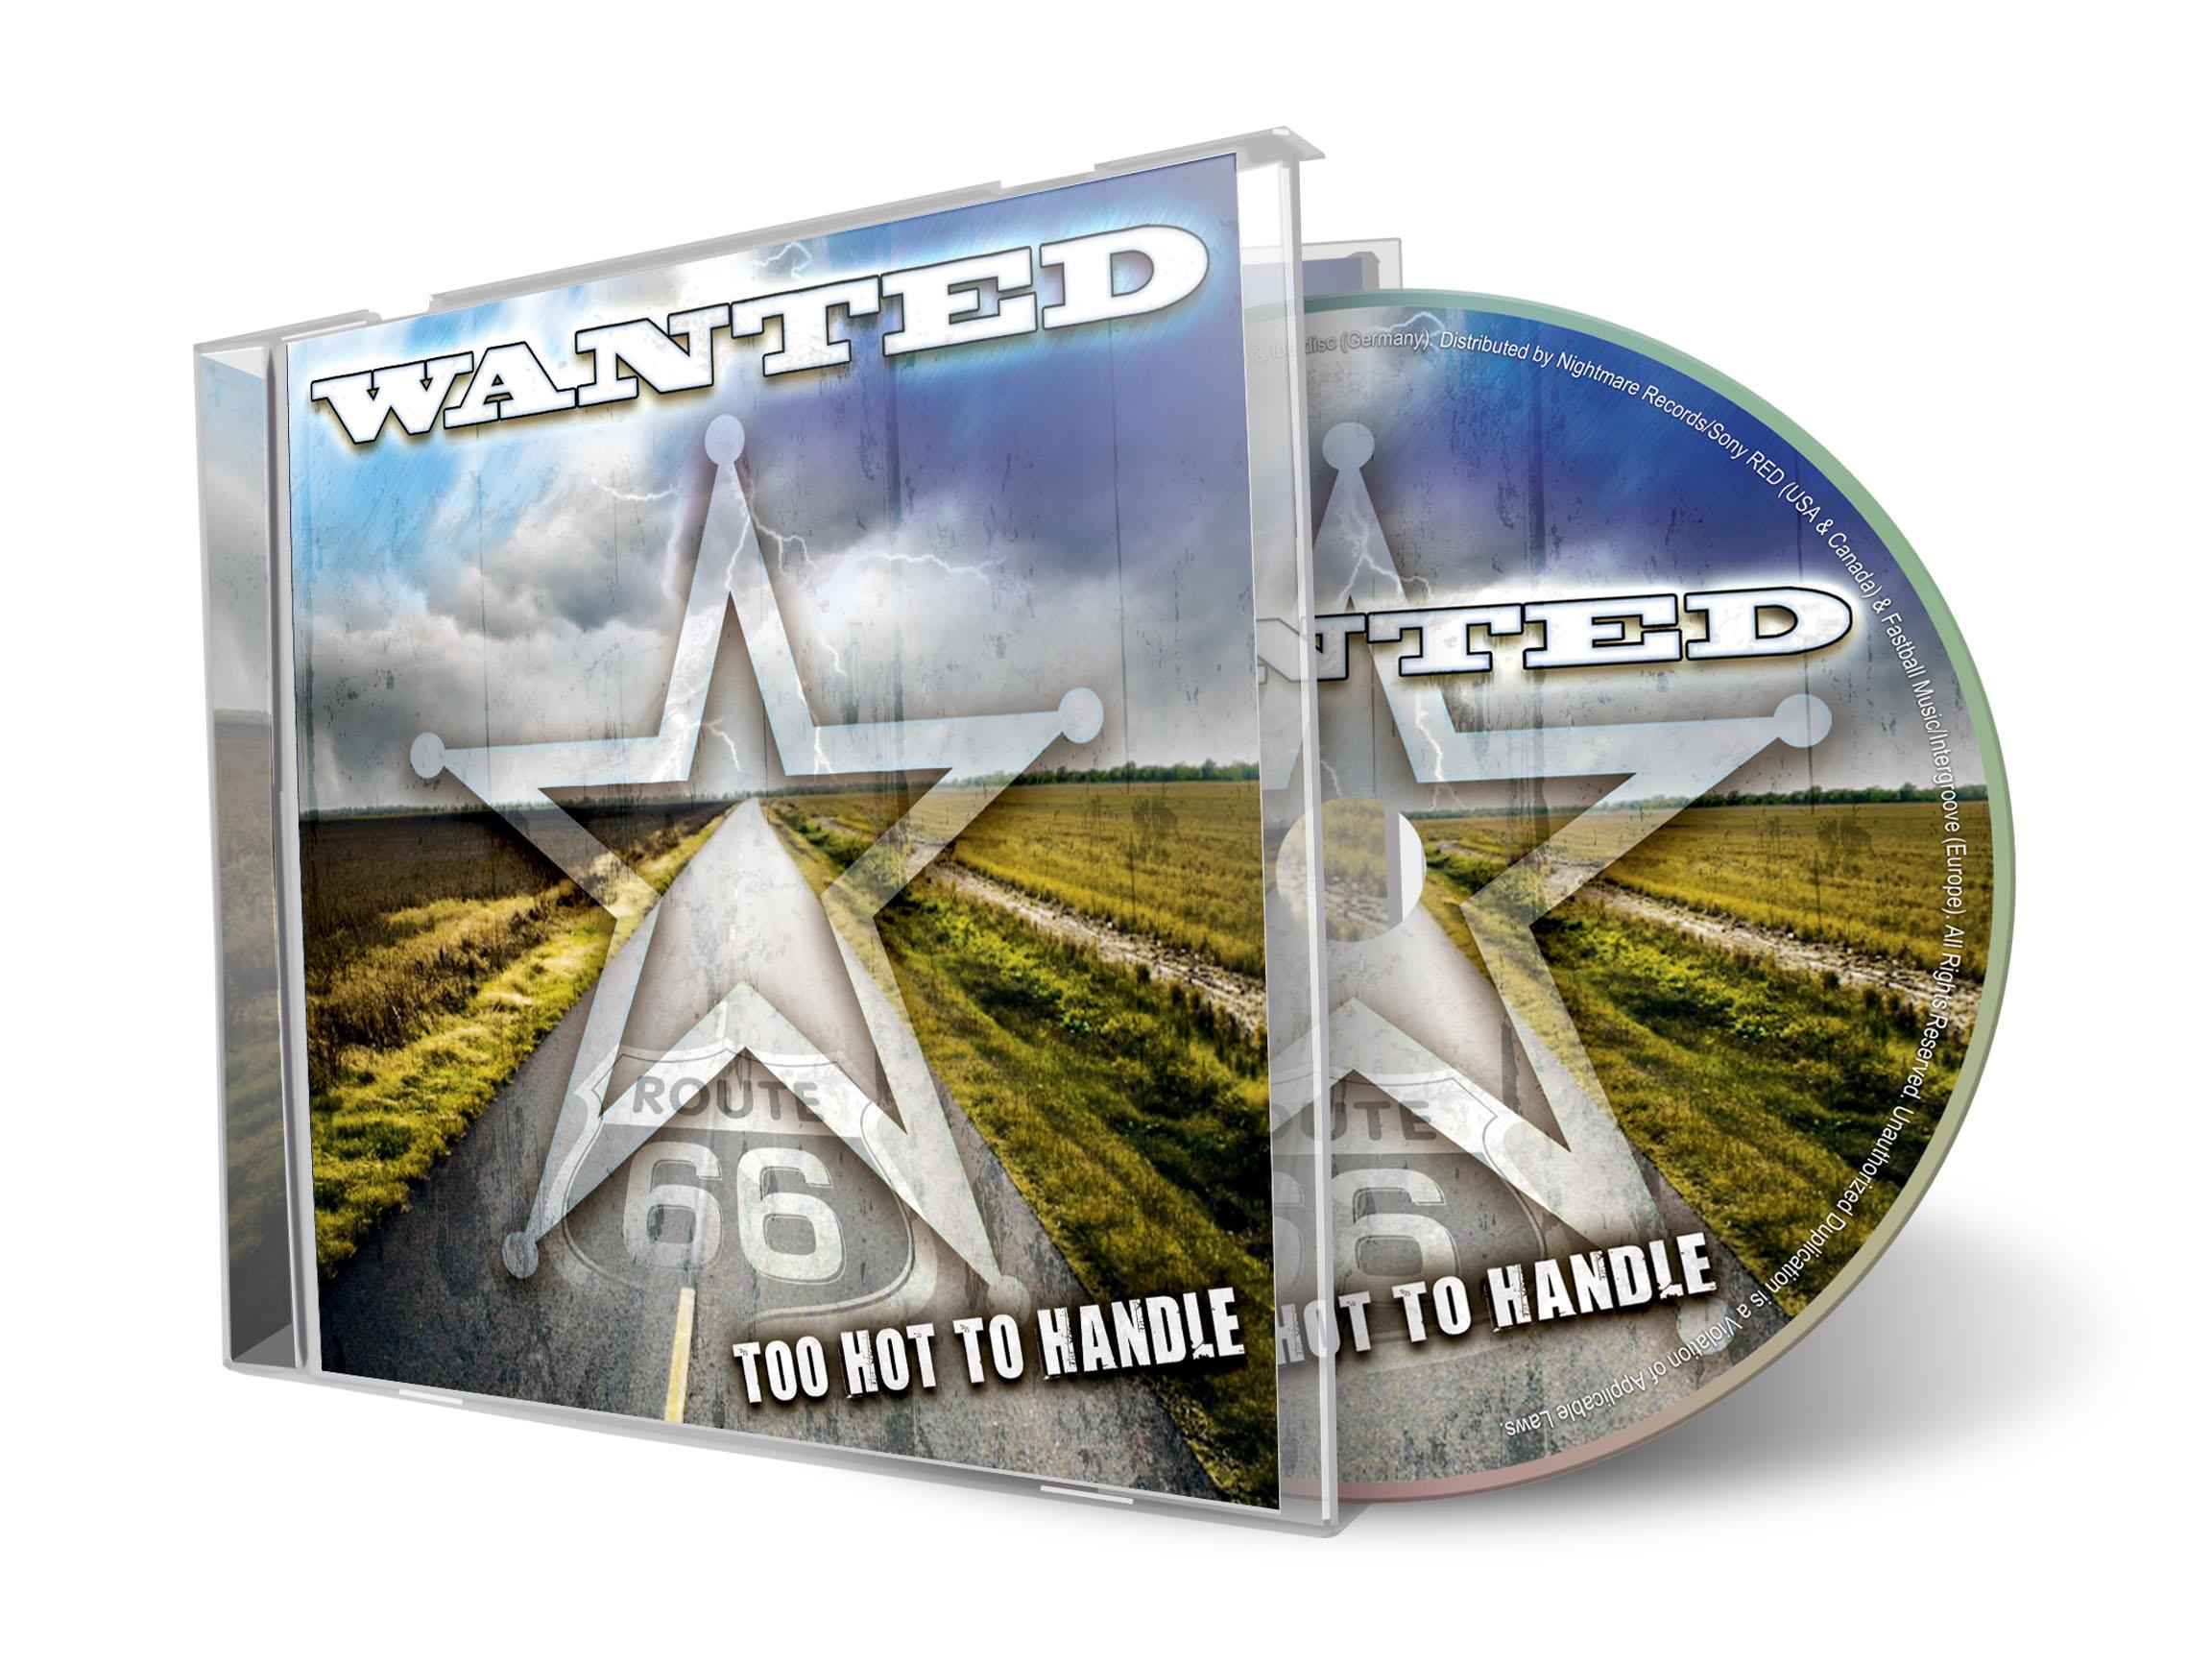 Wanted - CD Mock-Up.jpg